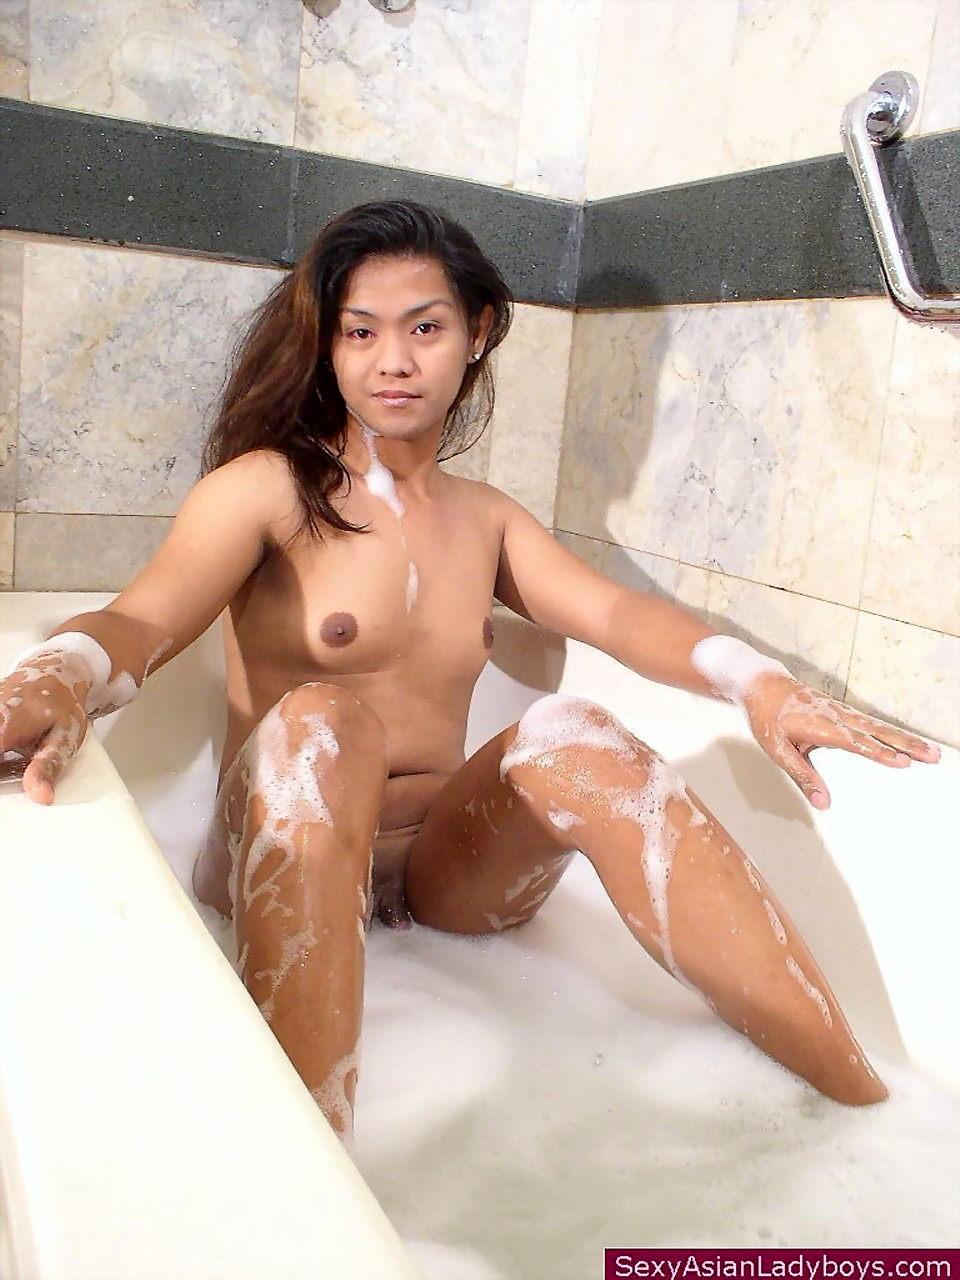 Kissable Small Dickgirl Jerking While Taking A Foam Bath